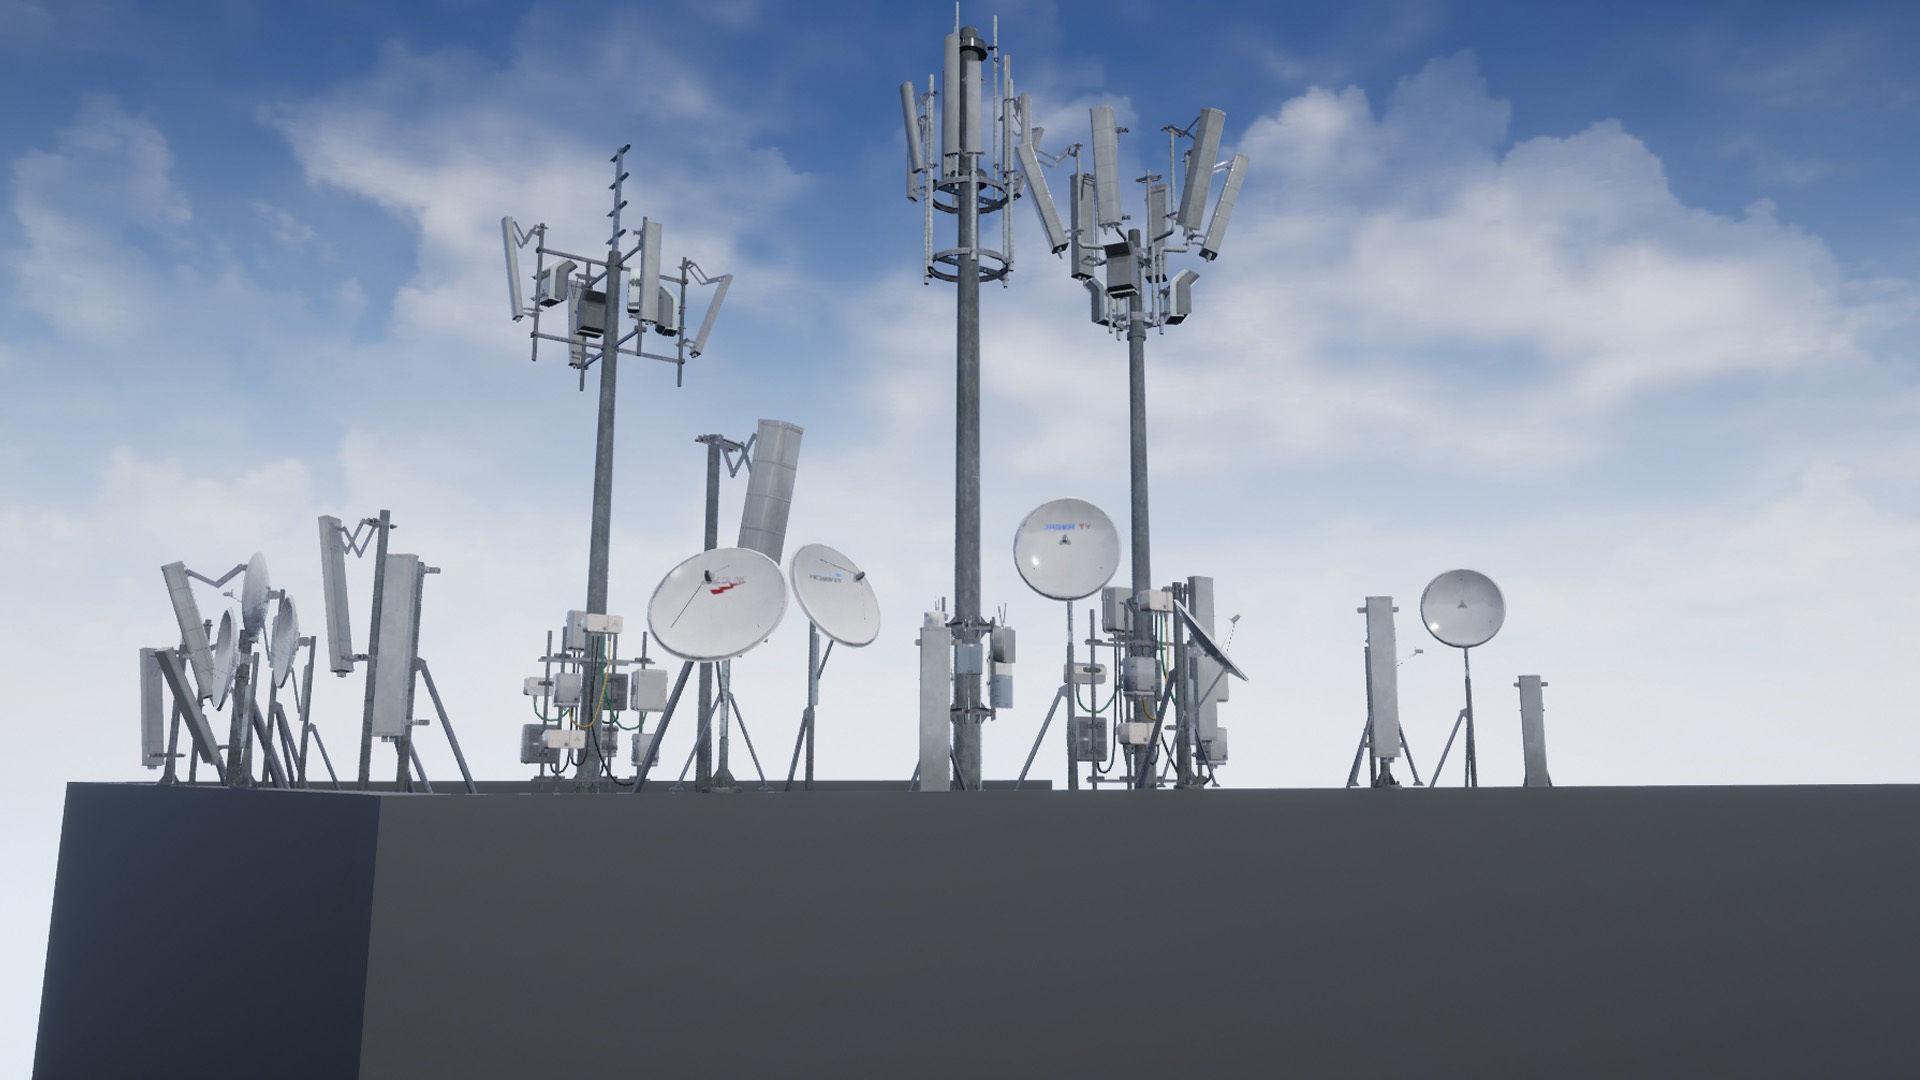 Cellular  TV  Radio  Antenna towers